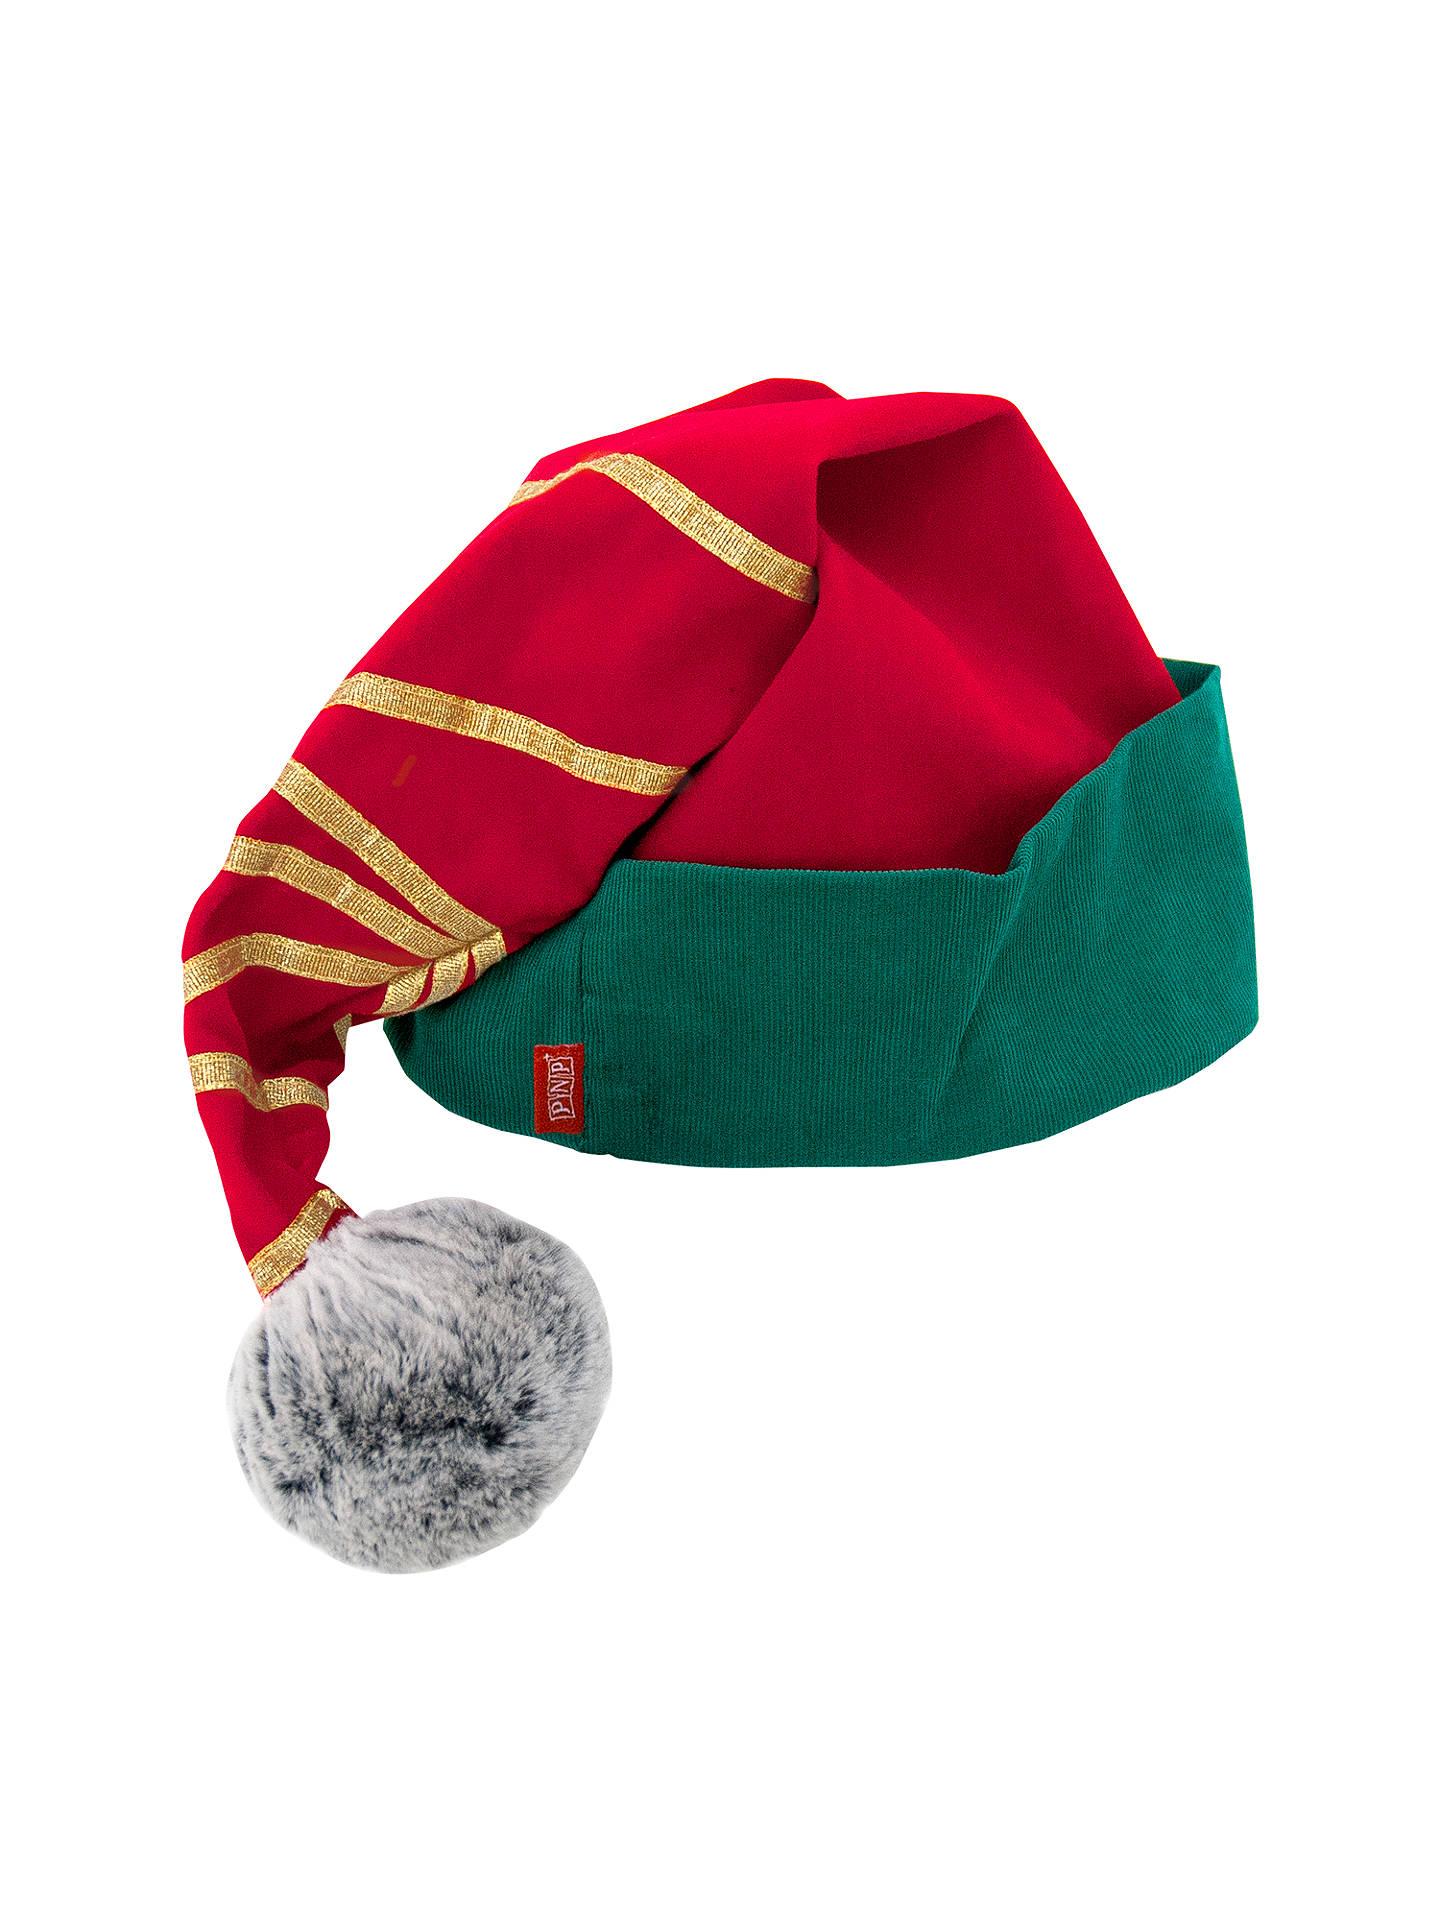 787a88109c7f9 Buy Portable North Pole Do-Good Elf Hat Online at johnlewis.com ...